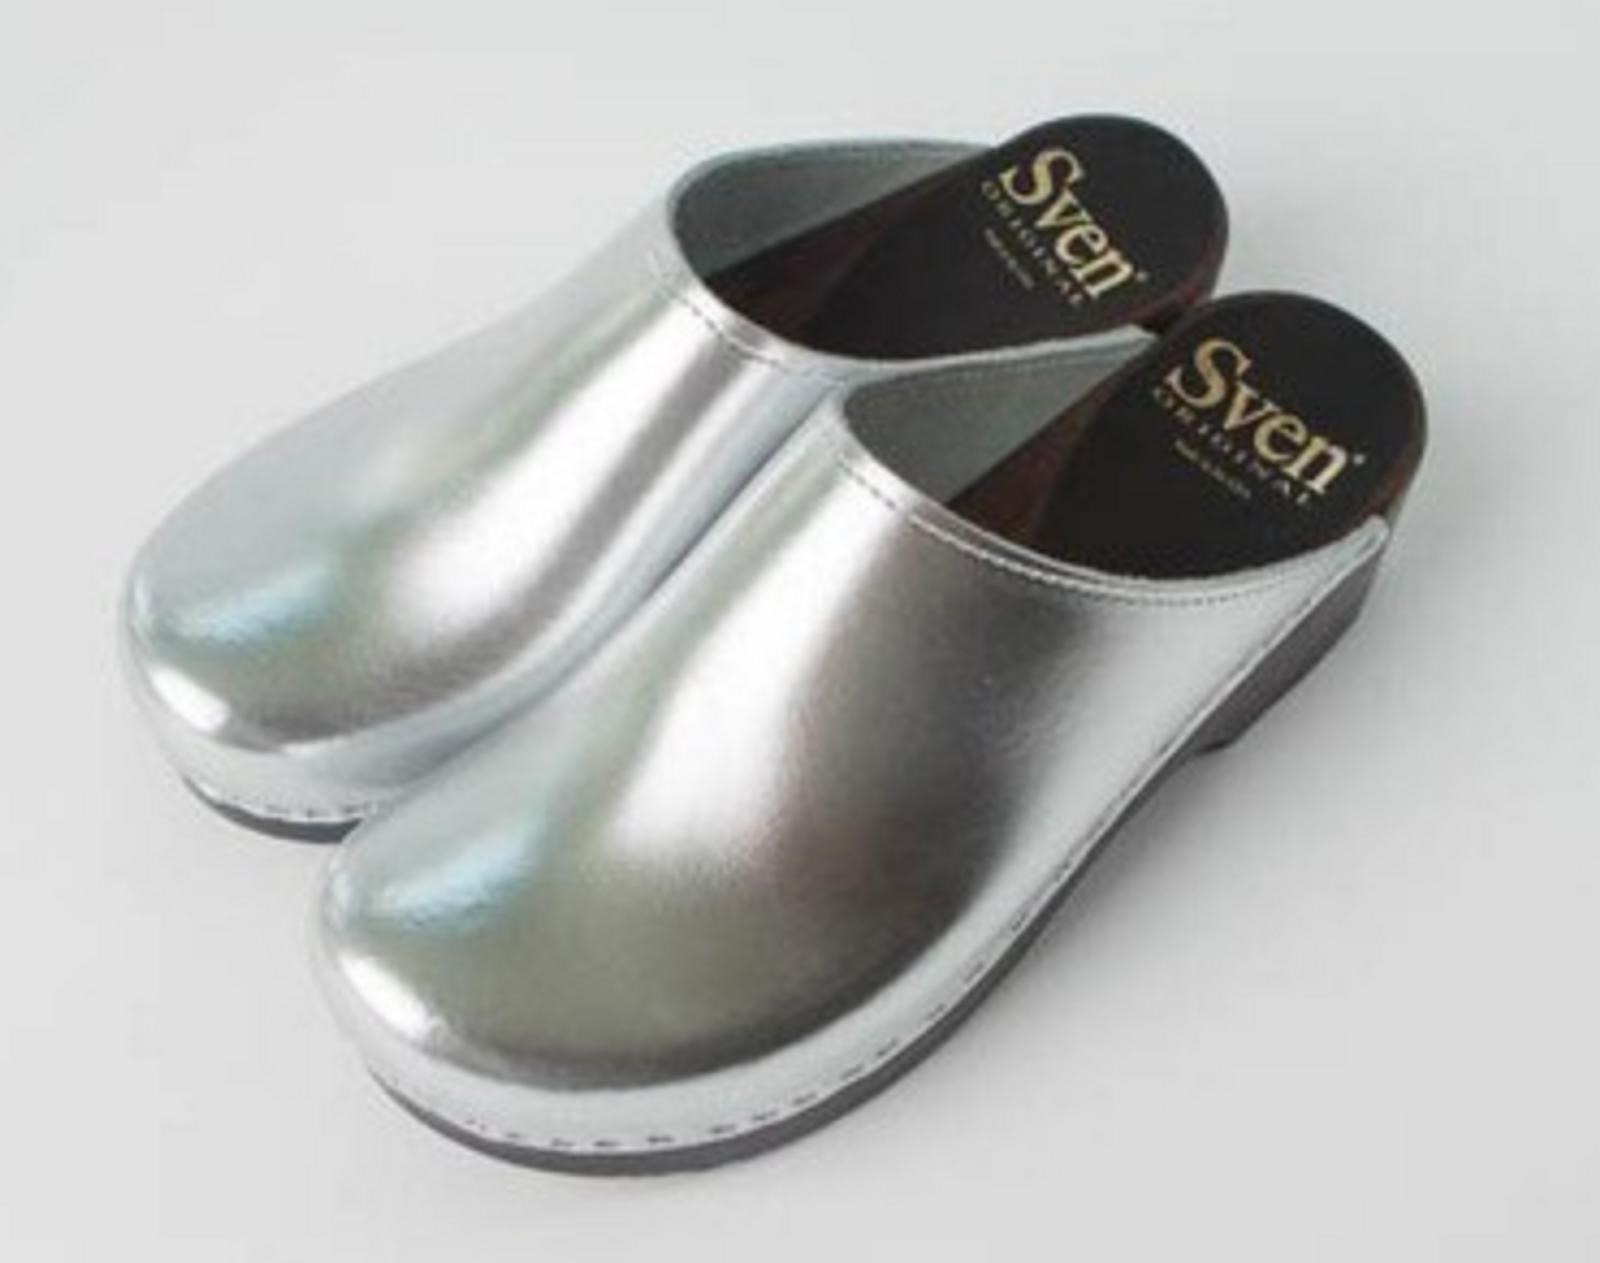 Silver Metallic with Cocoa Base